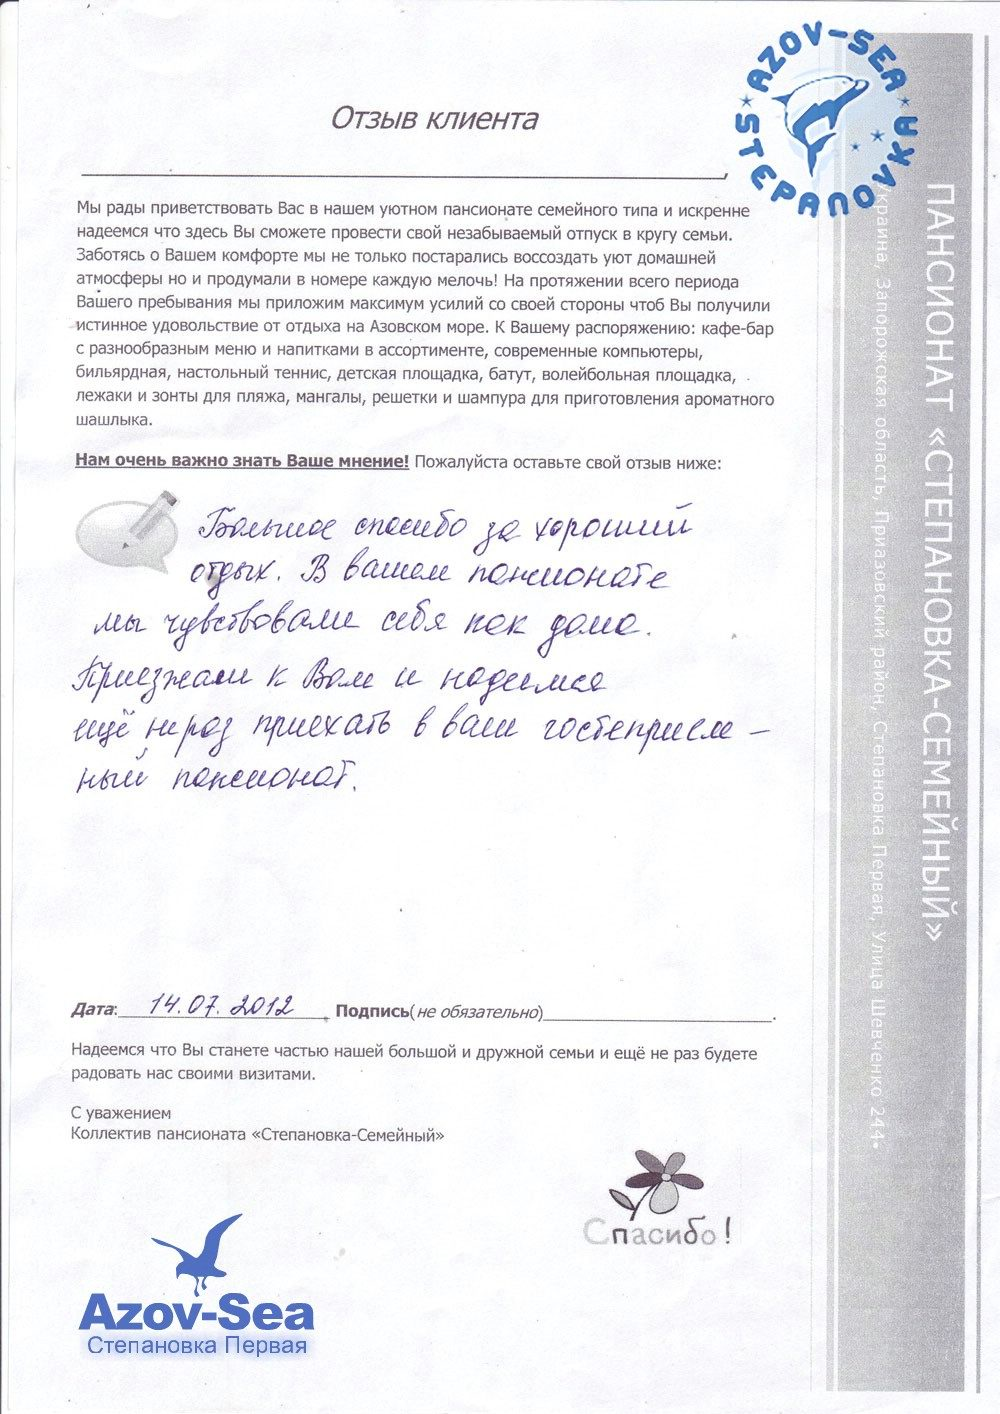 Пансионат СТЕПАНОВКА. Отзыв клиента. Отдых на Азовском море.